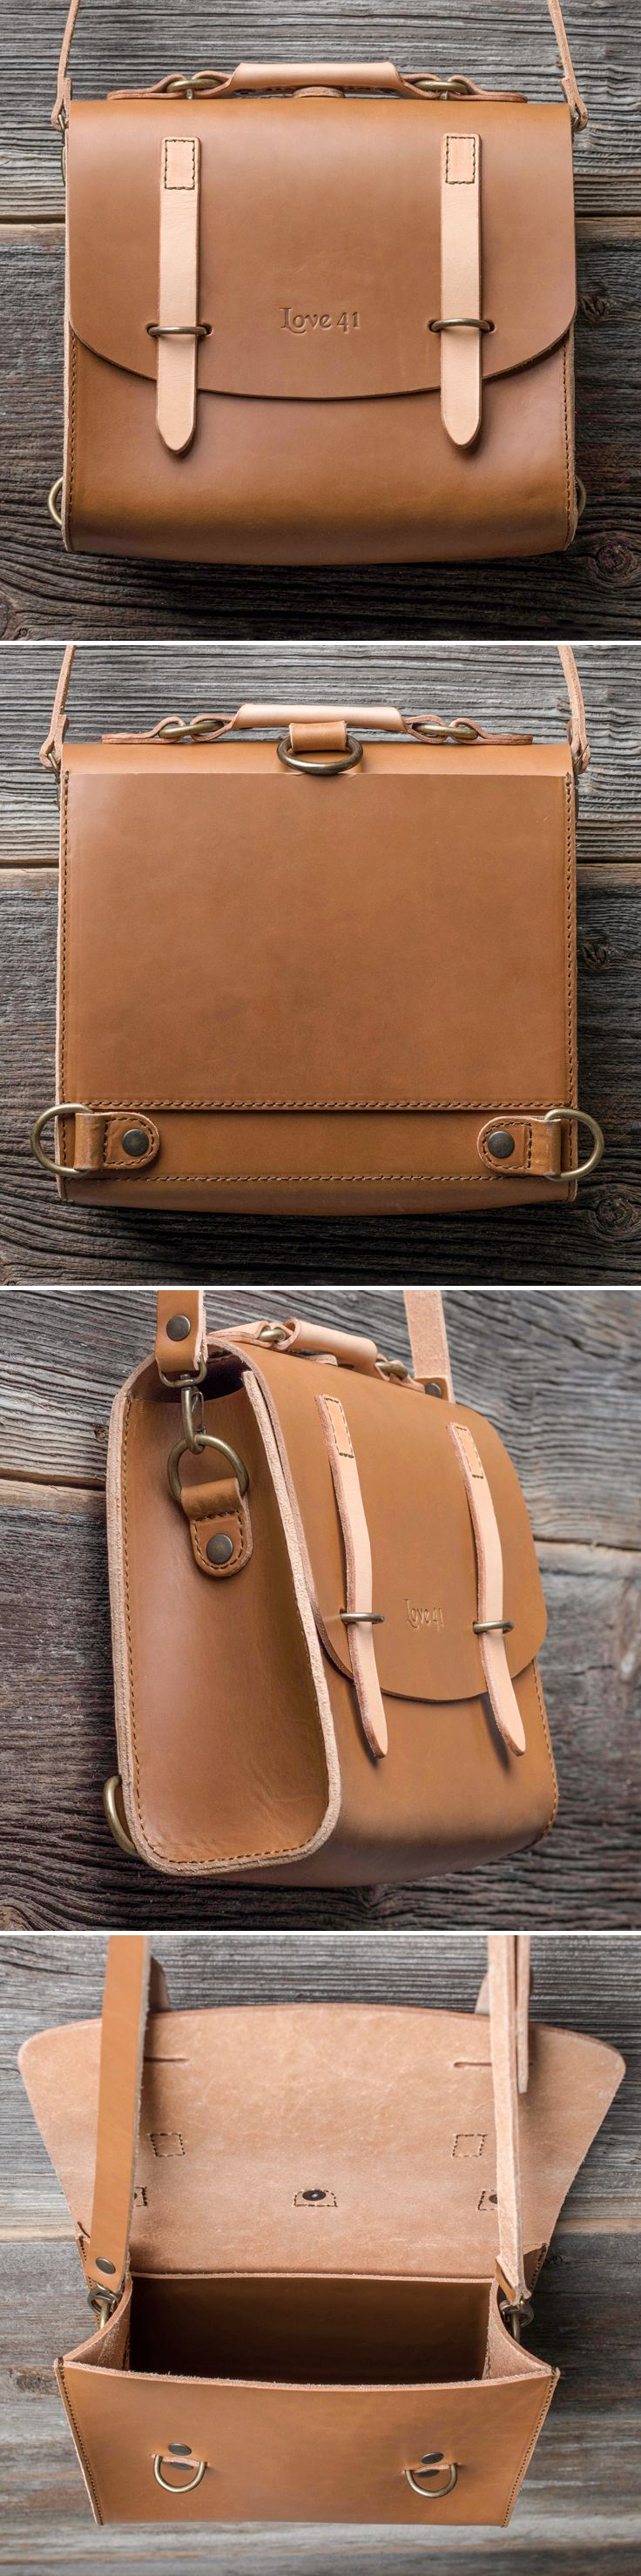 The Satchel Purse | Full Grain Leather | 41 Year Warranty | $209.00